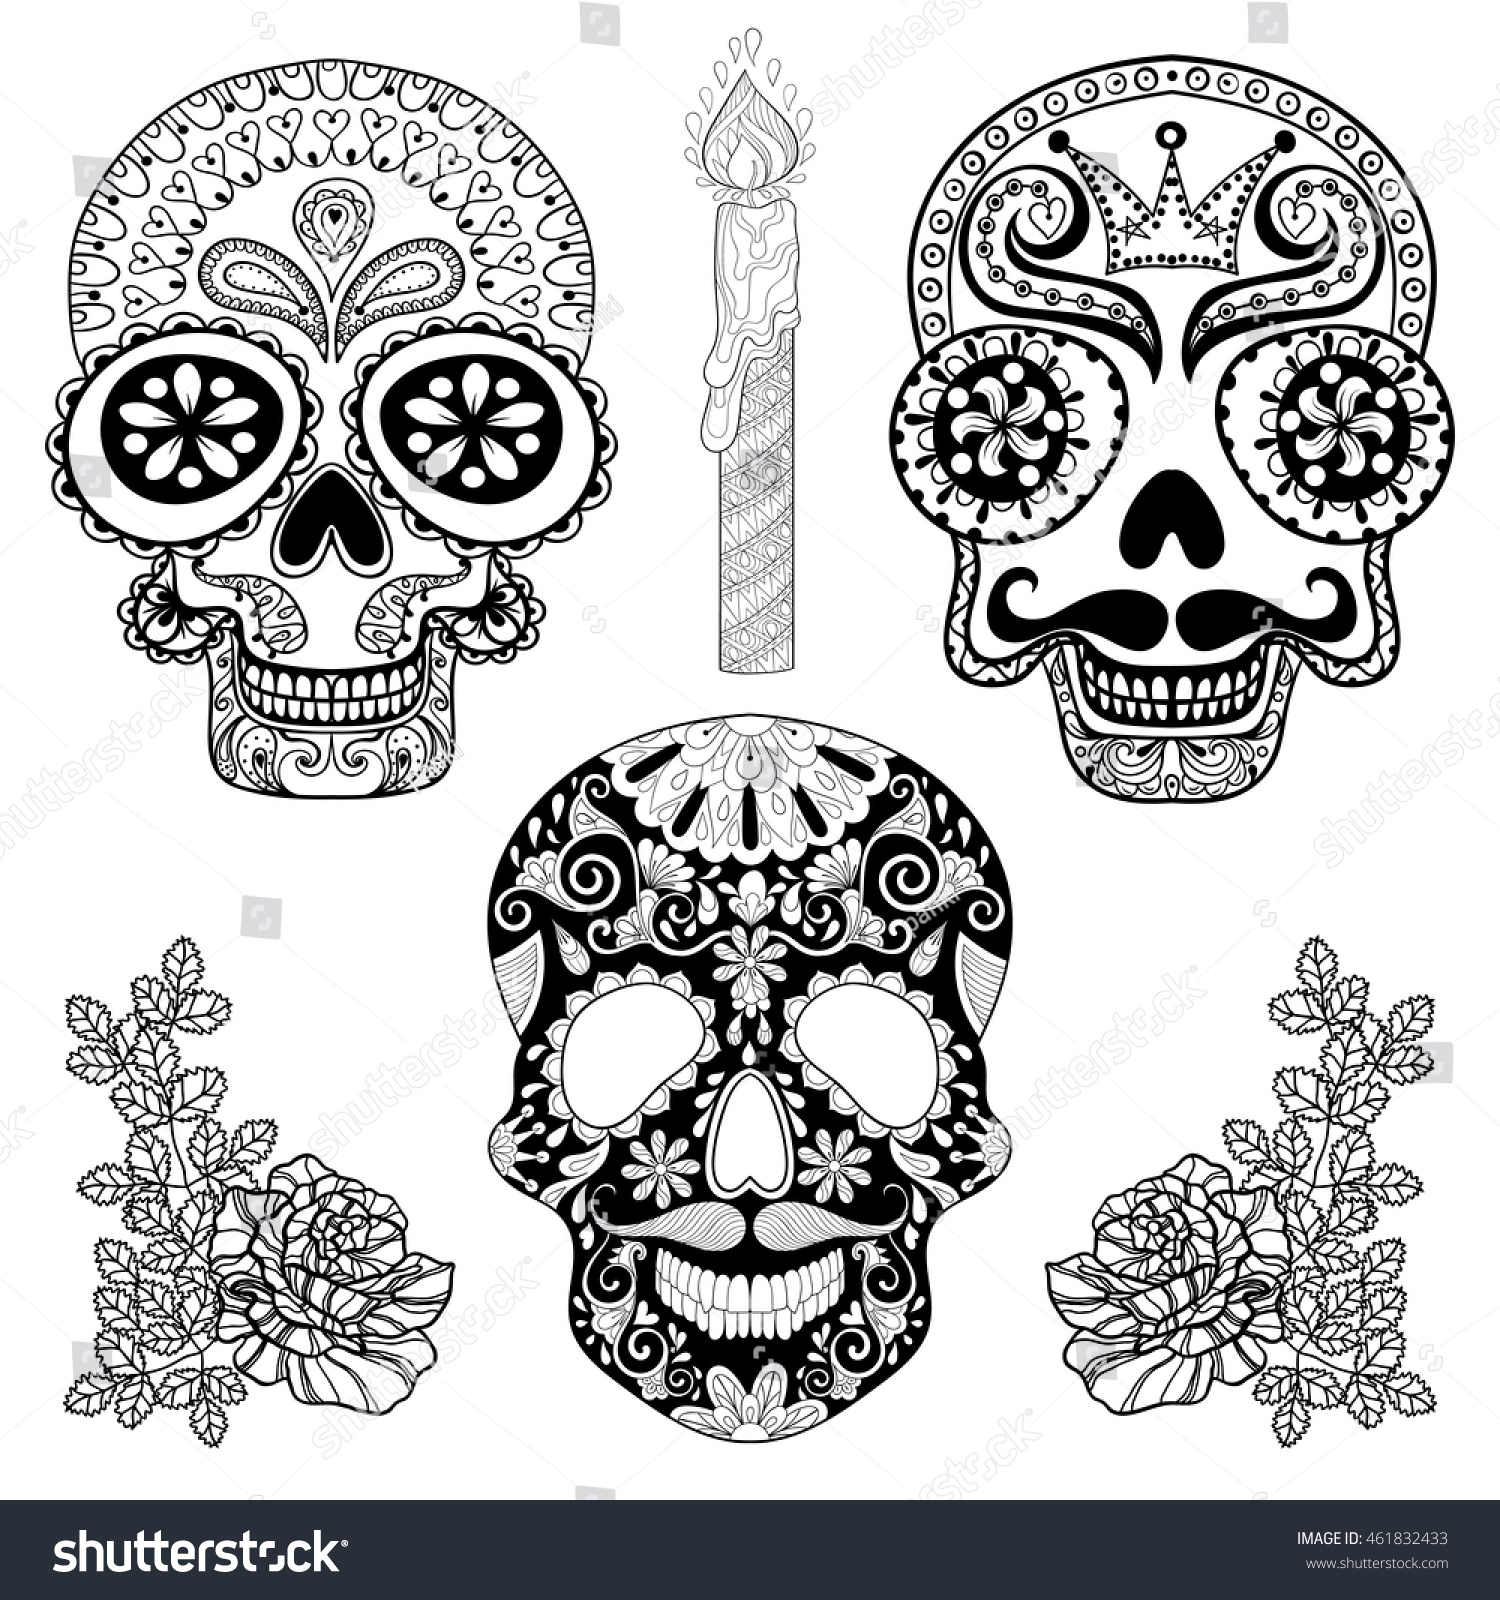 Zentangle Stylized Patterned Skulls Set Candle Stock Vector ...